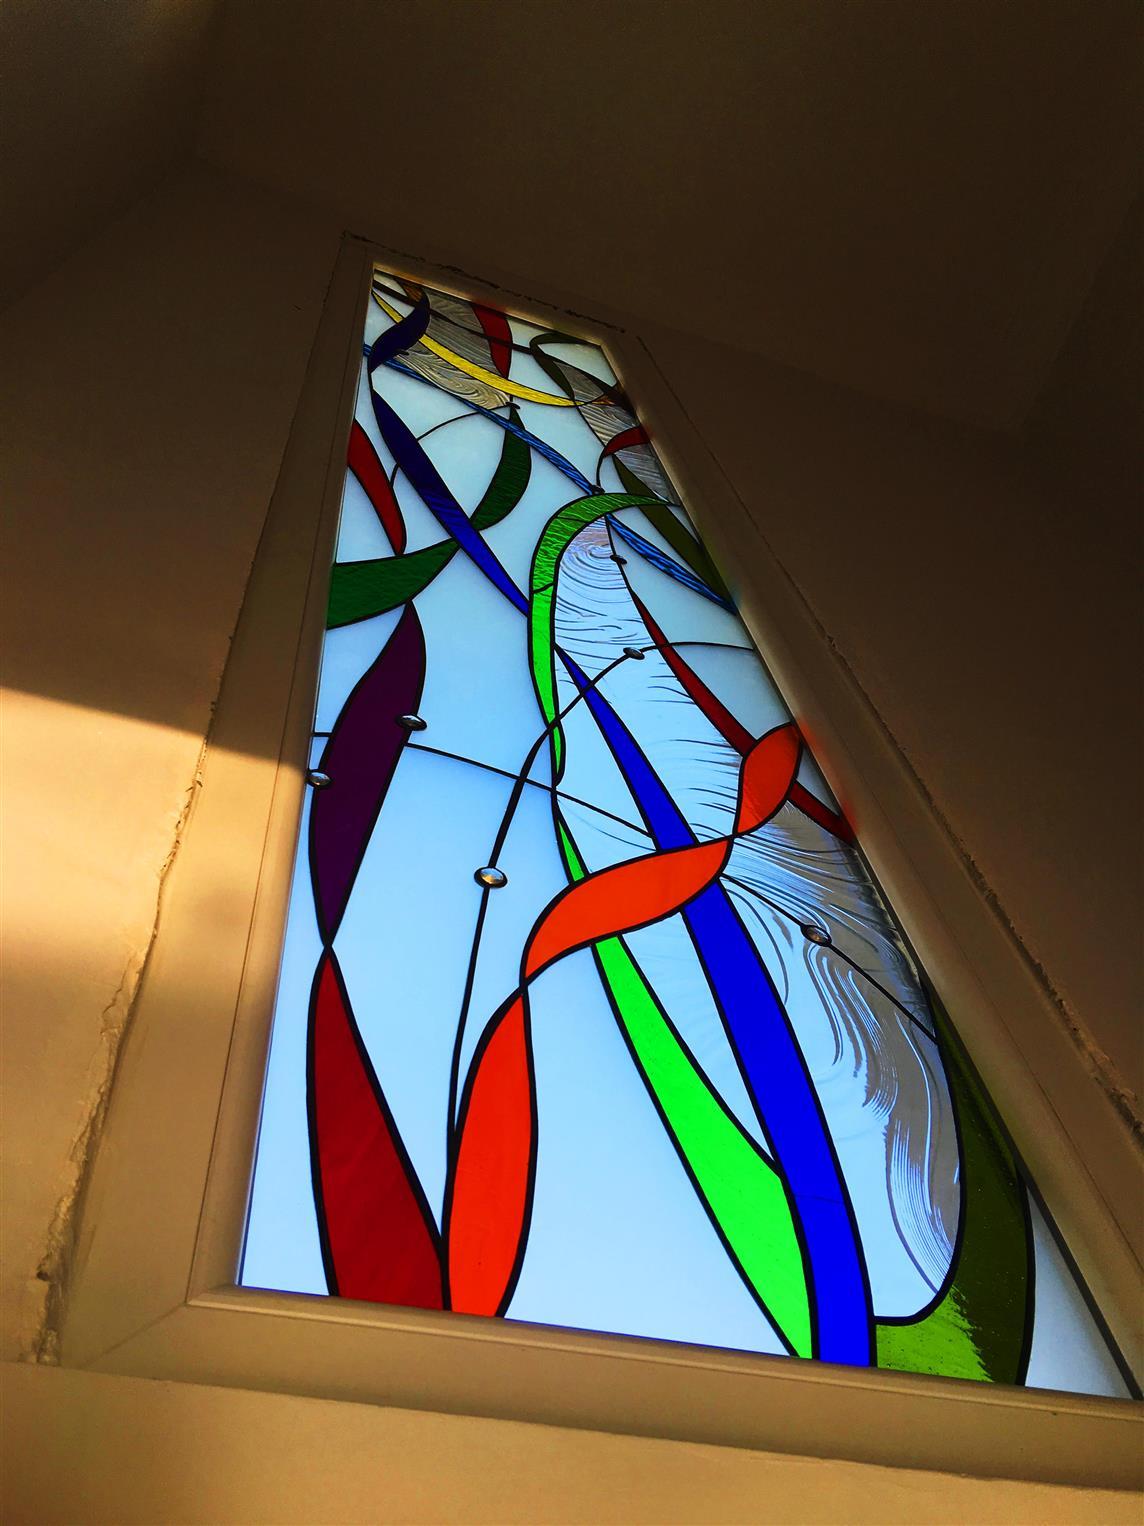 merdiven-cikisi-vitraylari20171221191655209.jpg izmir vitray çalışması